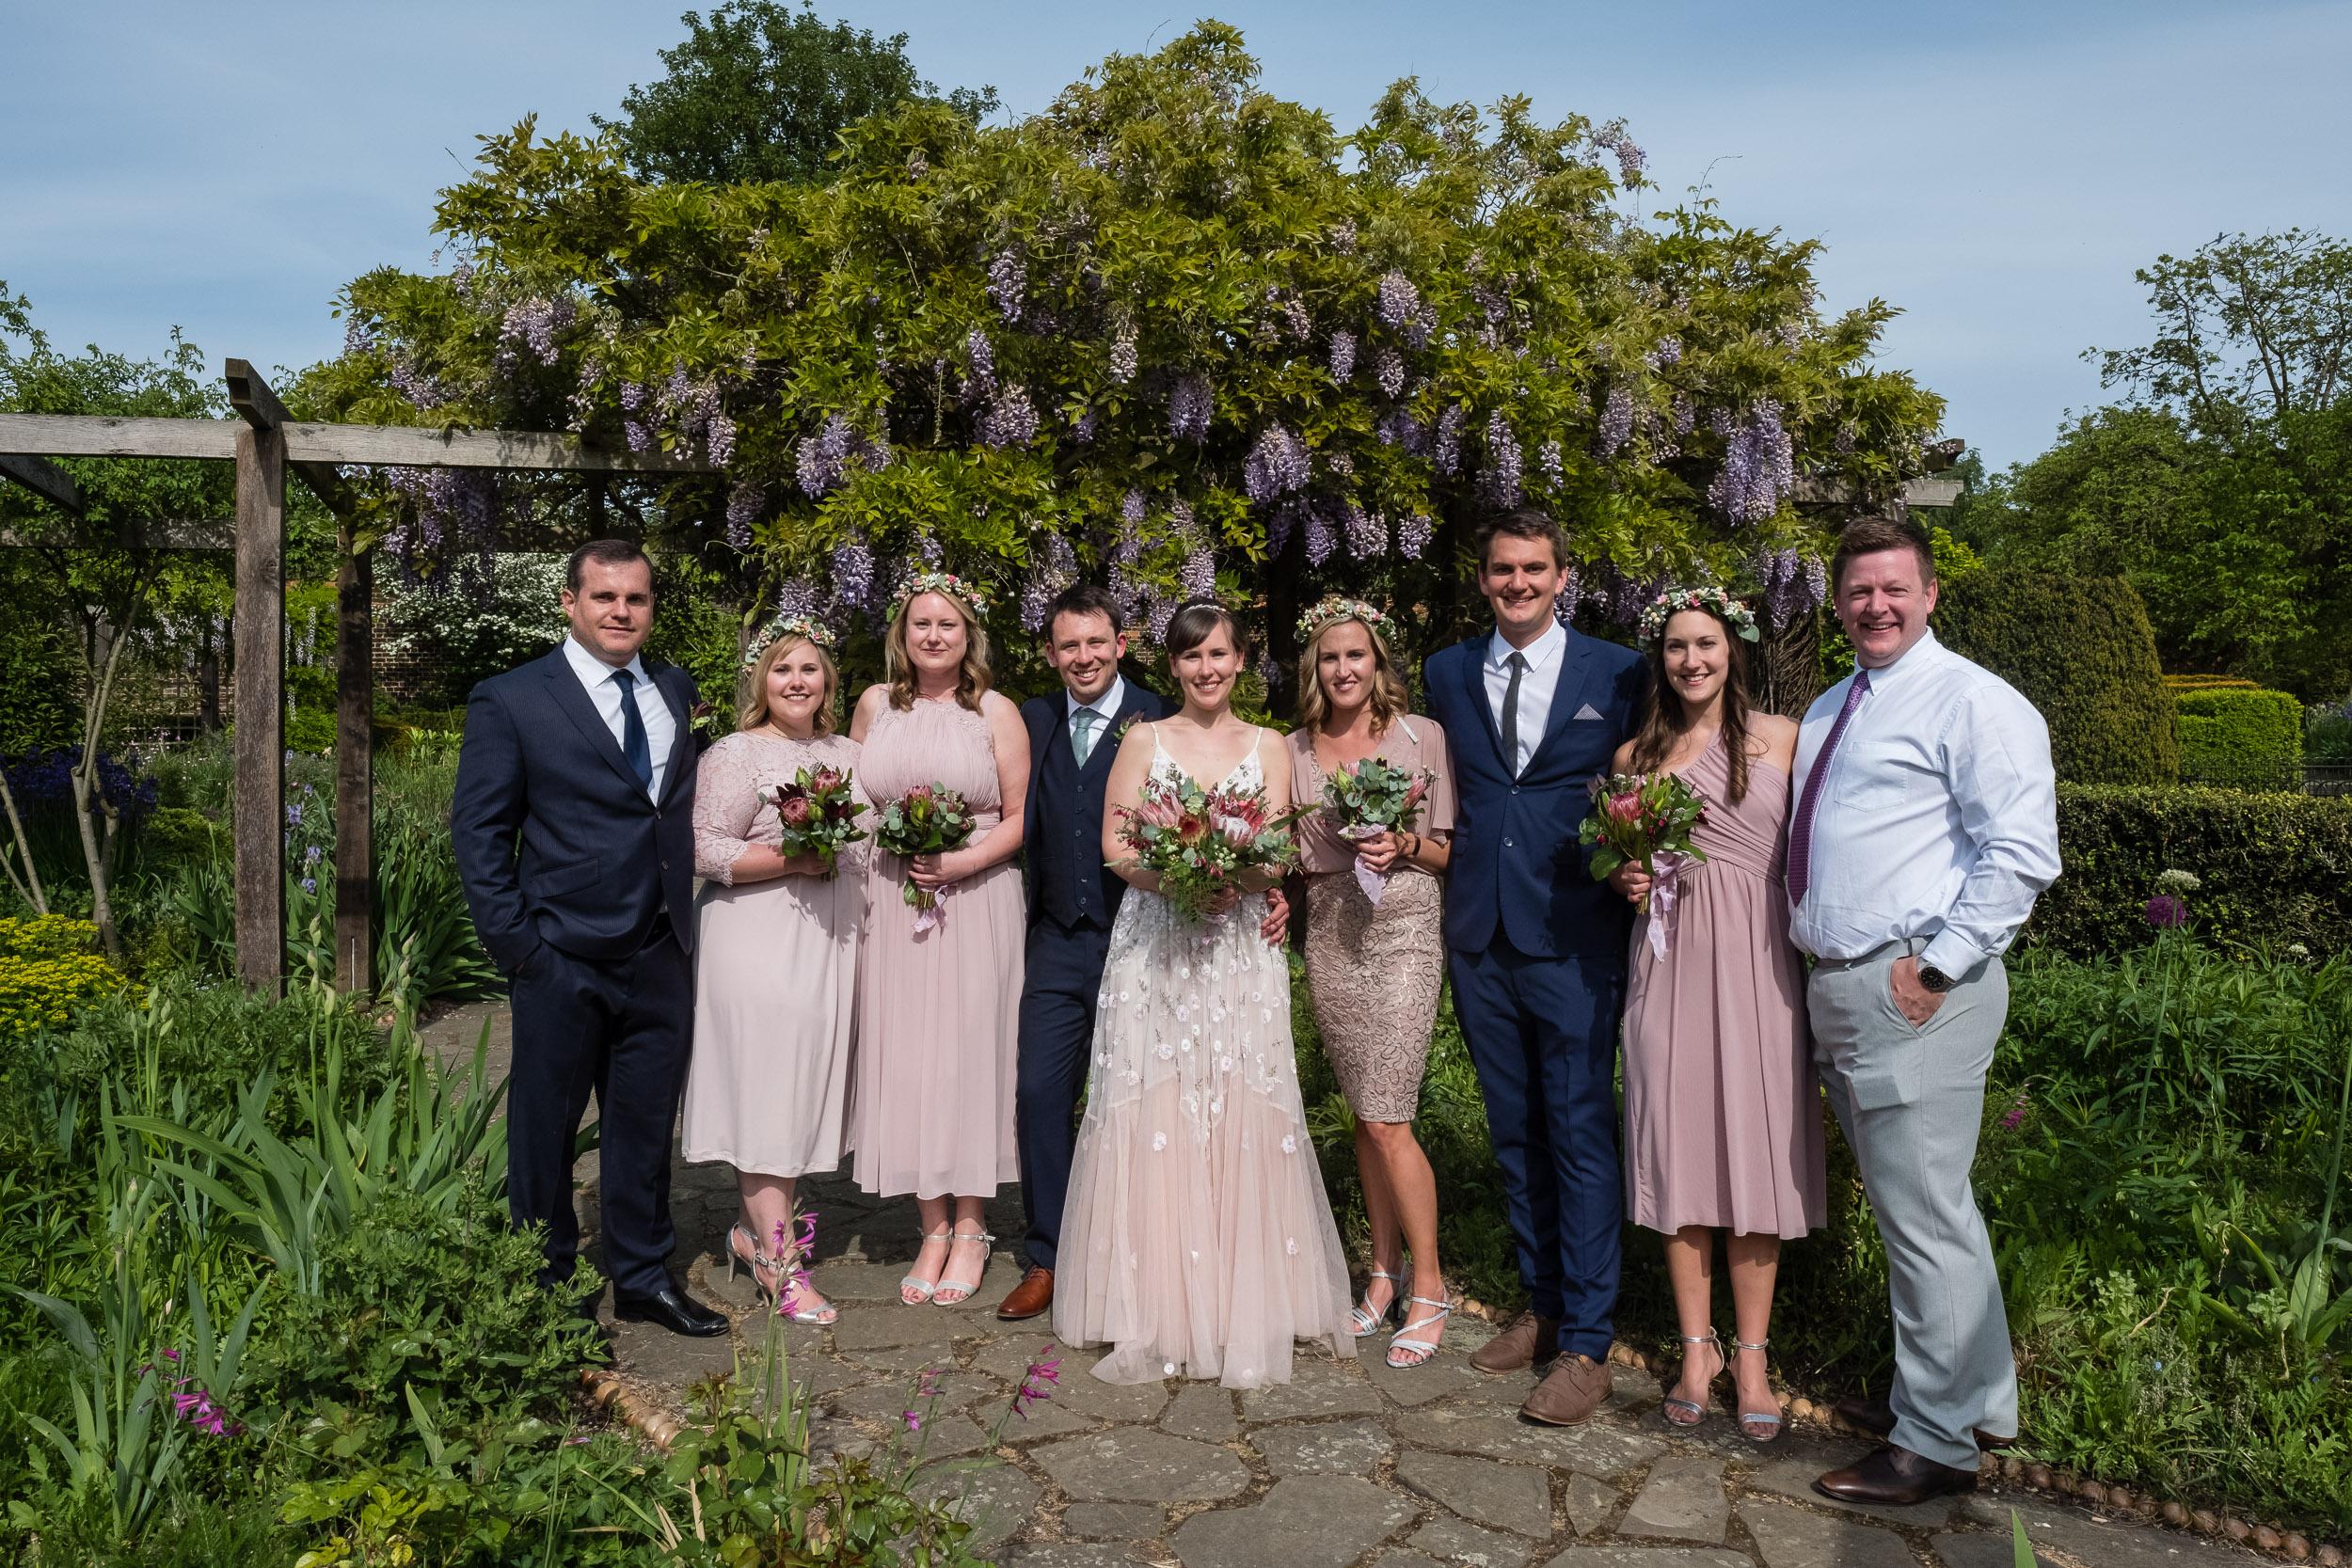 brockwell-lido-brixton-herne-hill-wedding-264.jpg